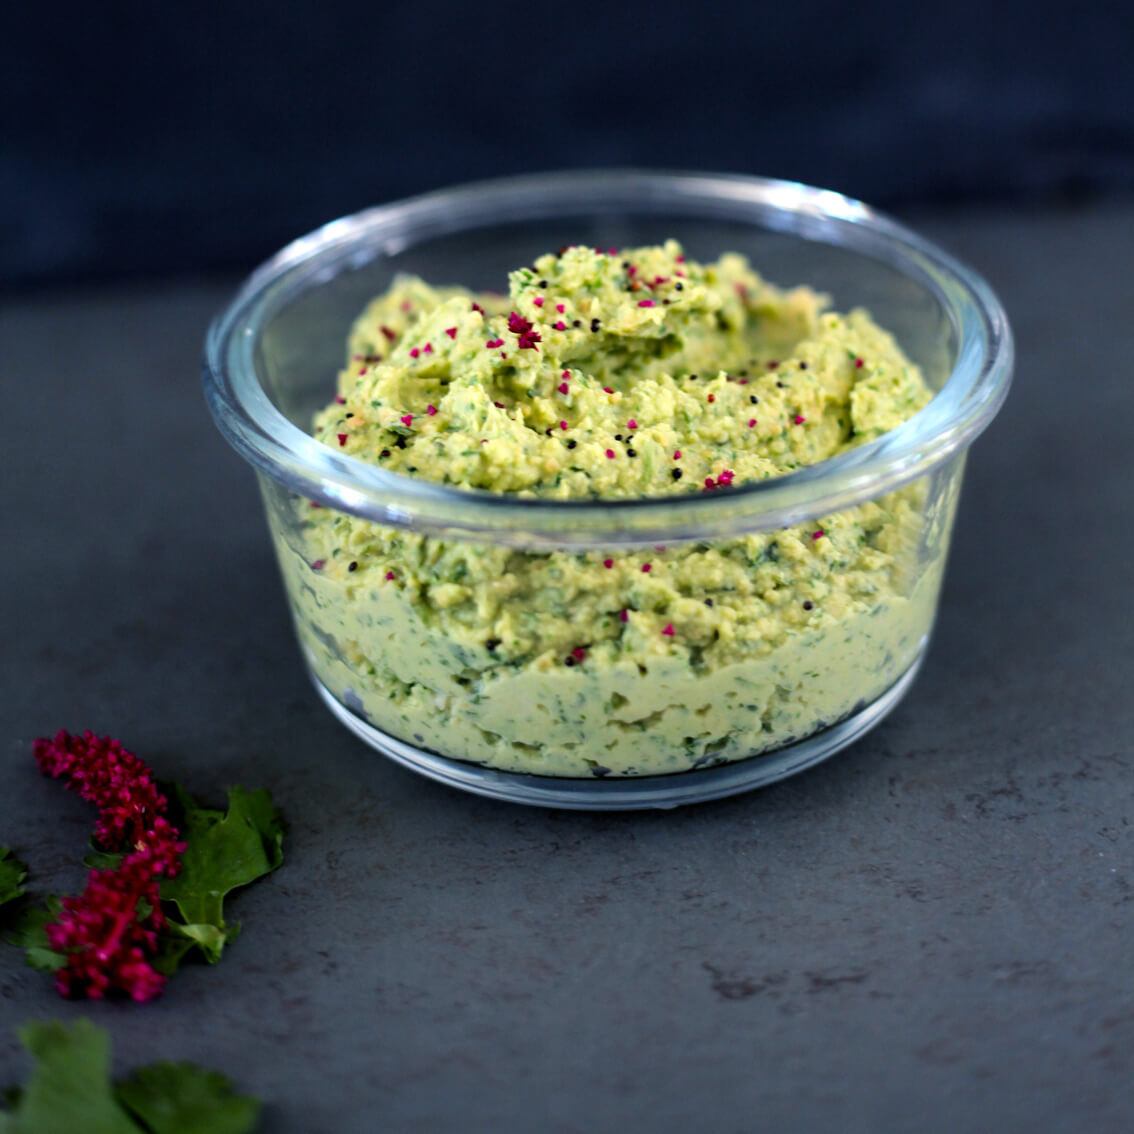 Green Cilantro Hummus